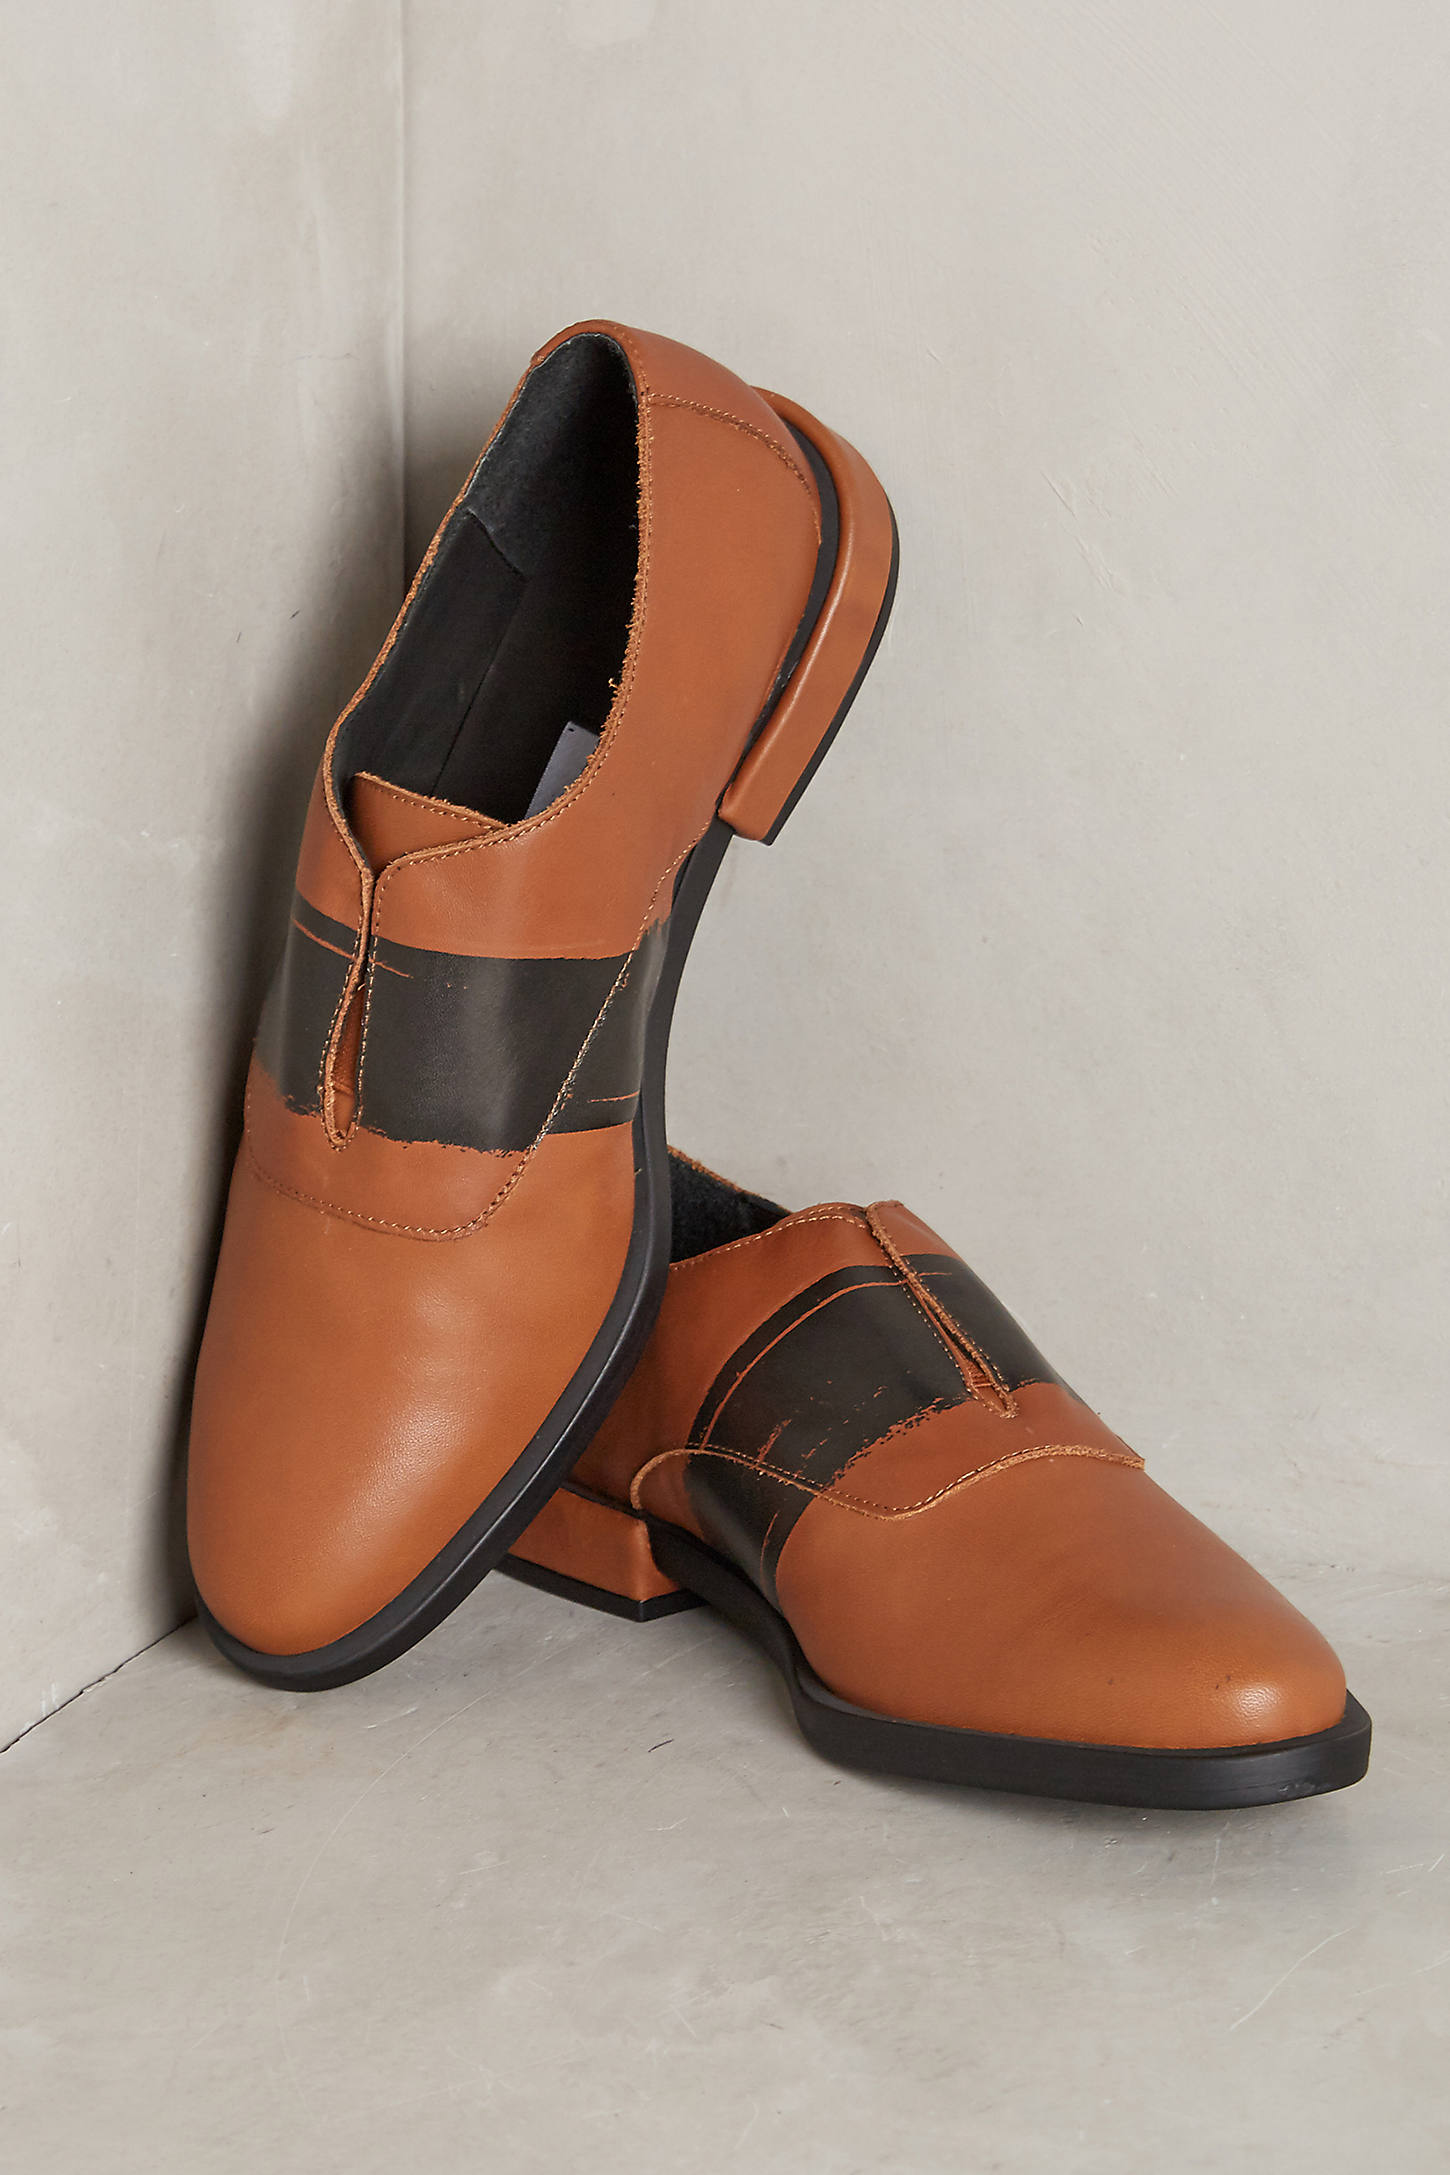 Miista Marta Leather Oxfords